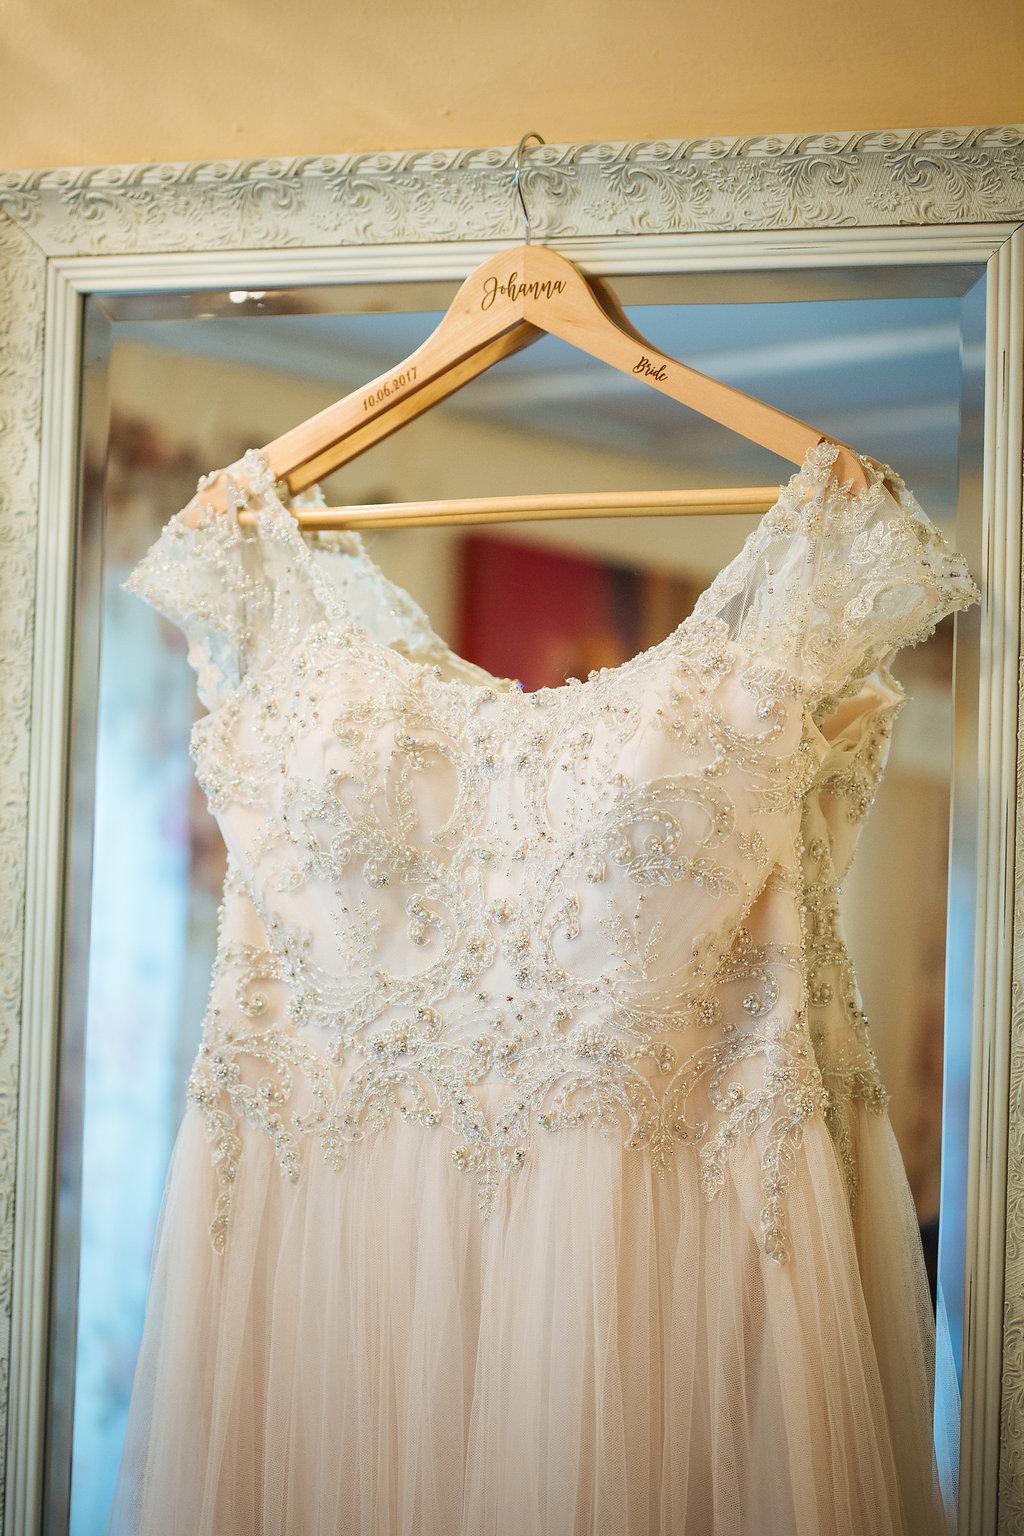 Julia + Johanna | Alyssa Lee Photography | Camrose Hill Flower Studio | details shot of bridal gown | soft pink tulle skirt with engraved wood hanger